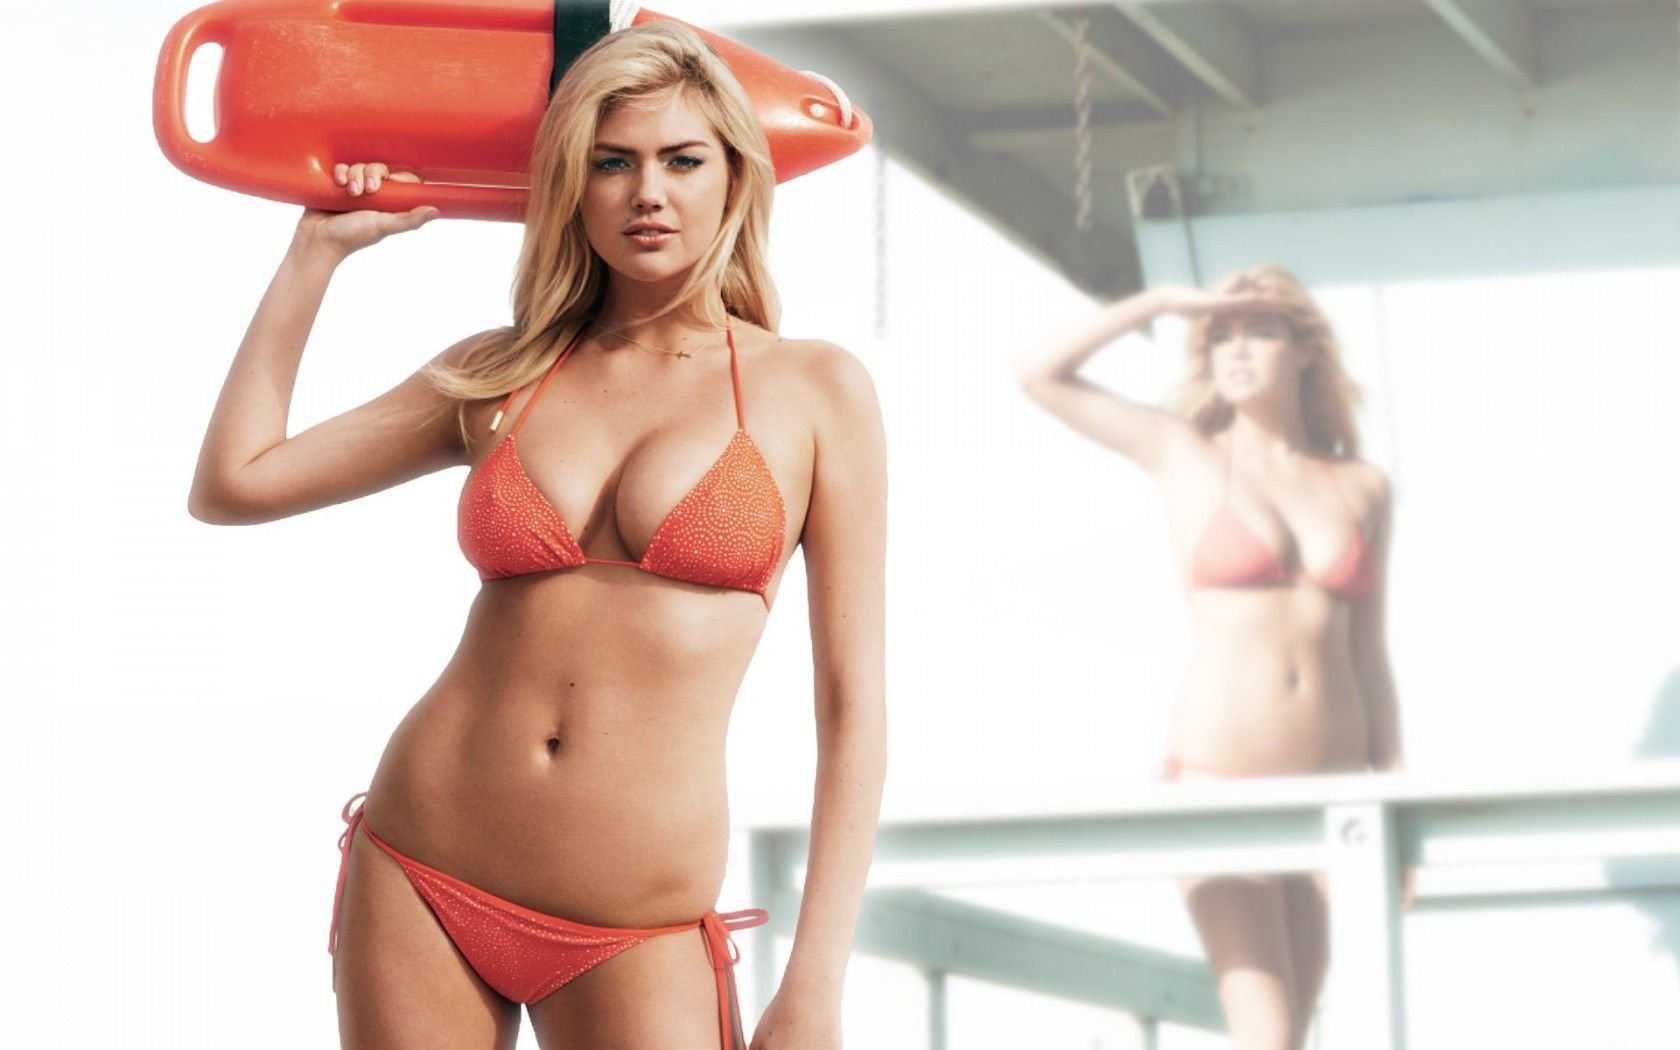 Kate upton as a lifeguard women pinterest lifeguard kate upton as a lifeguard voltagebd Choice Image